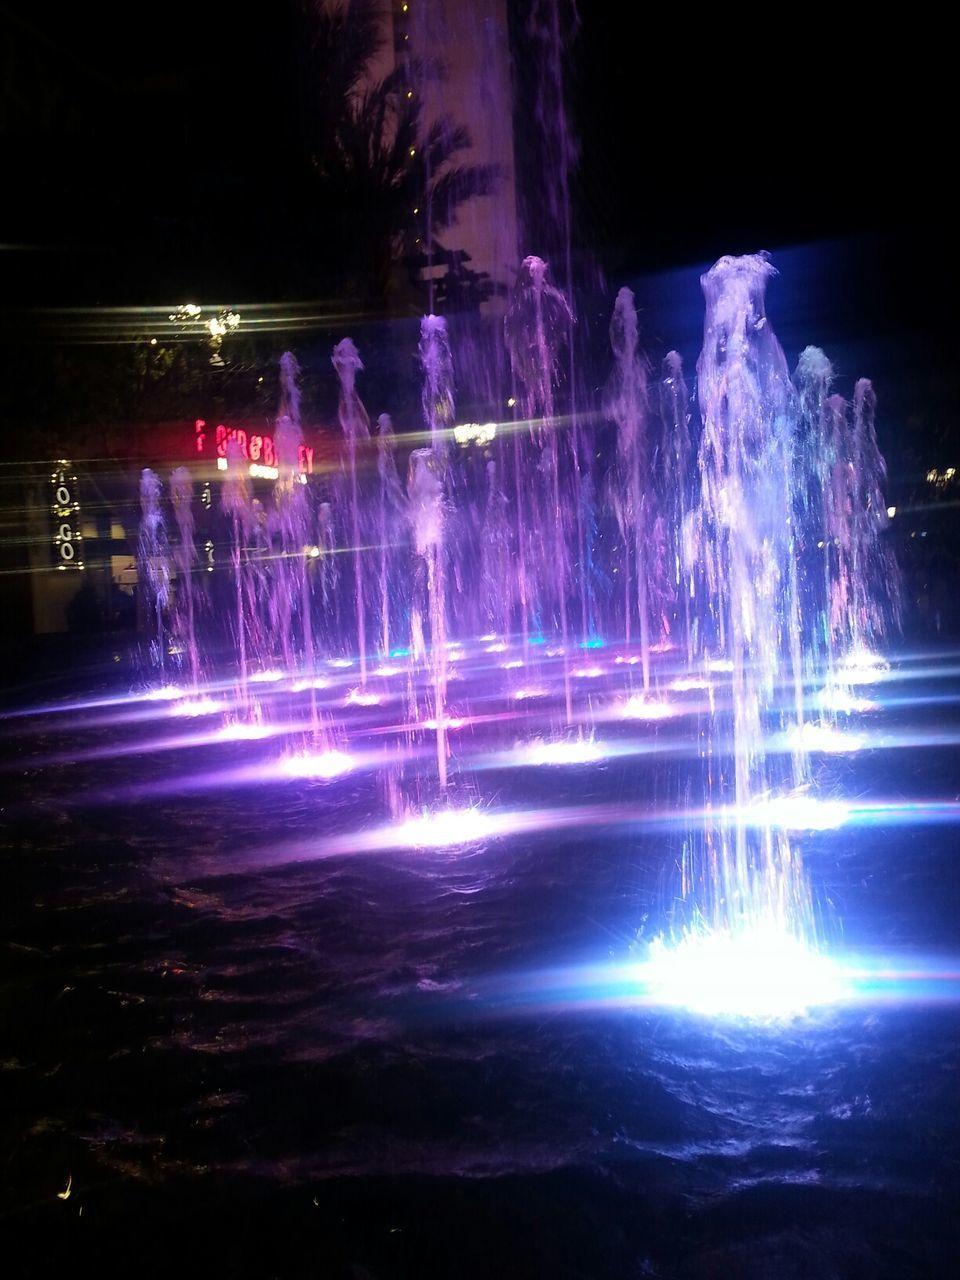 illuminated, night, long exposure, motion, no people, water, outdoors, lightning